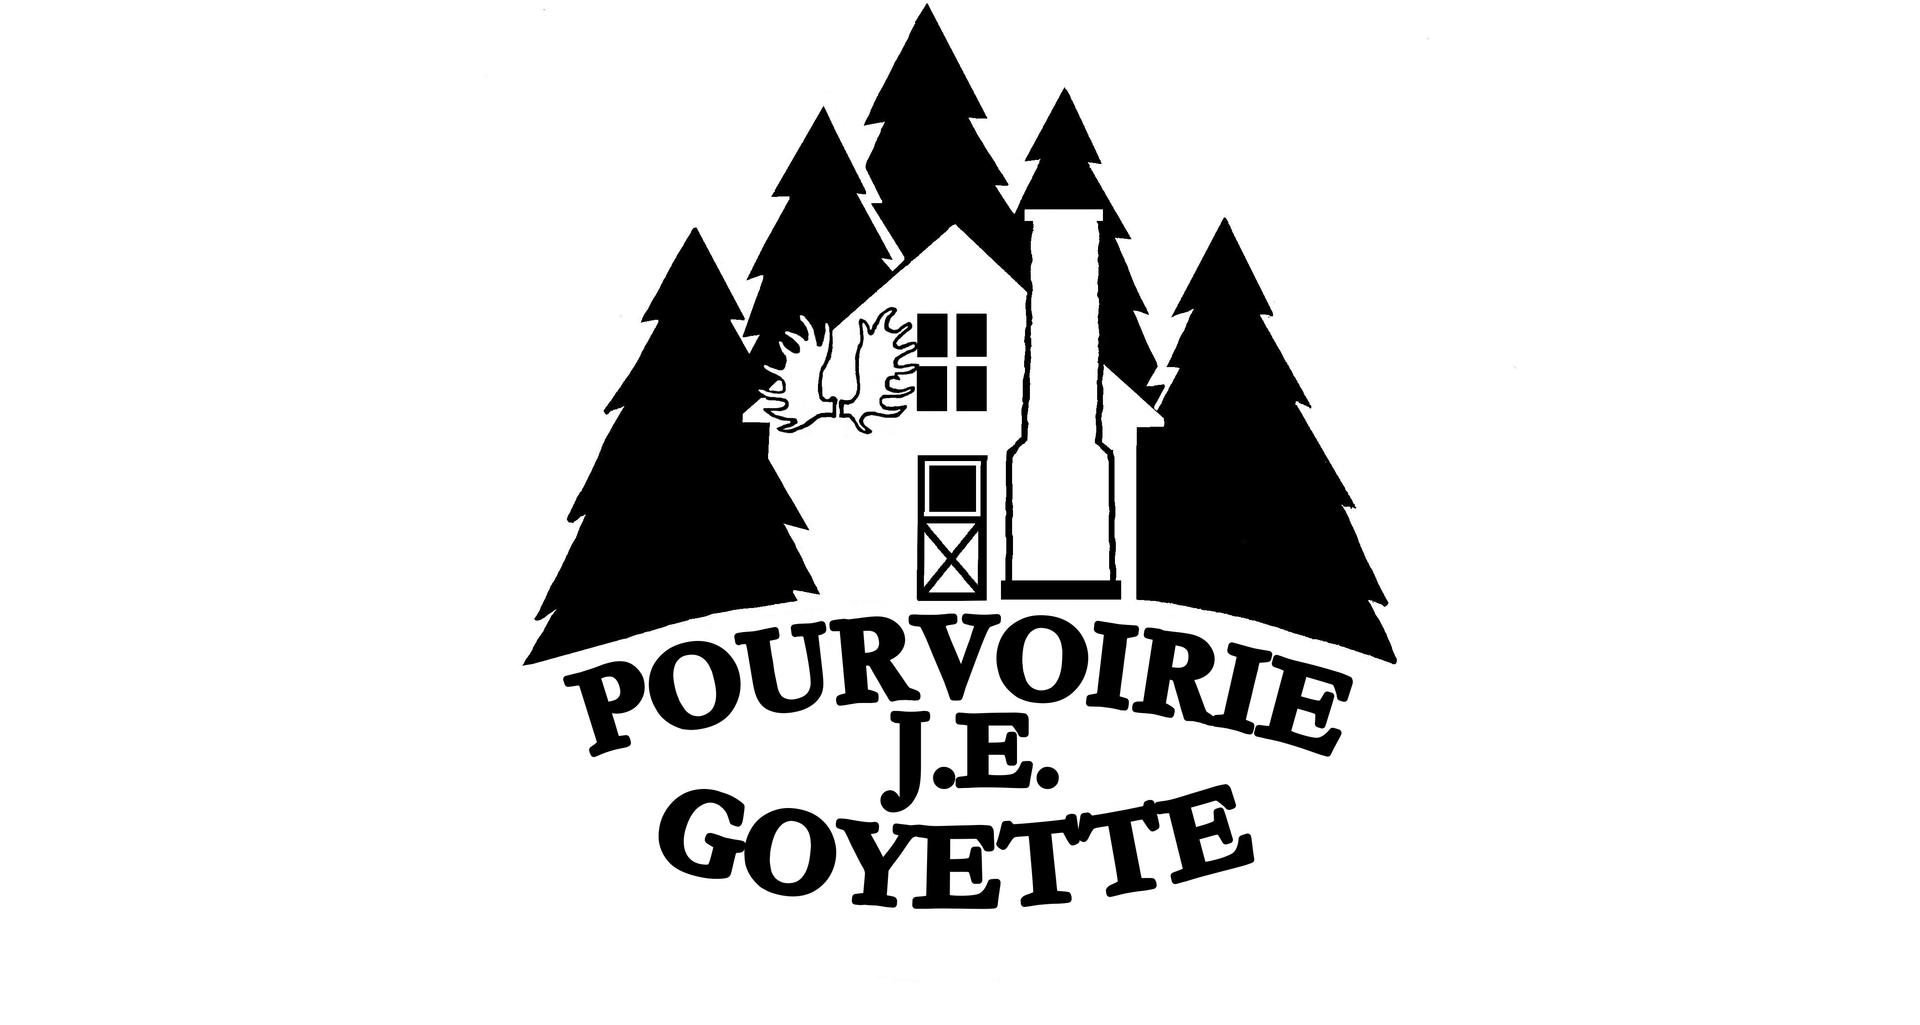 Pourvoirie J.E. Goyette